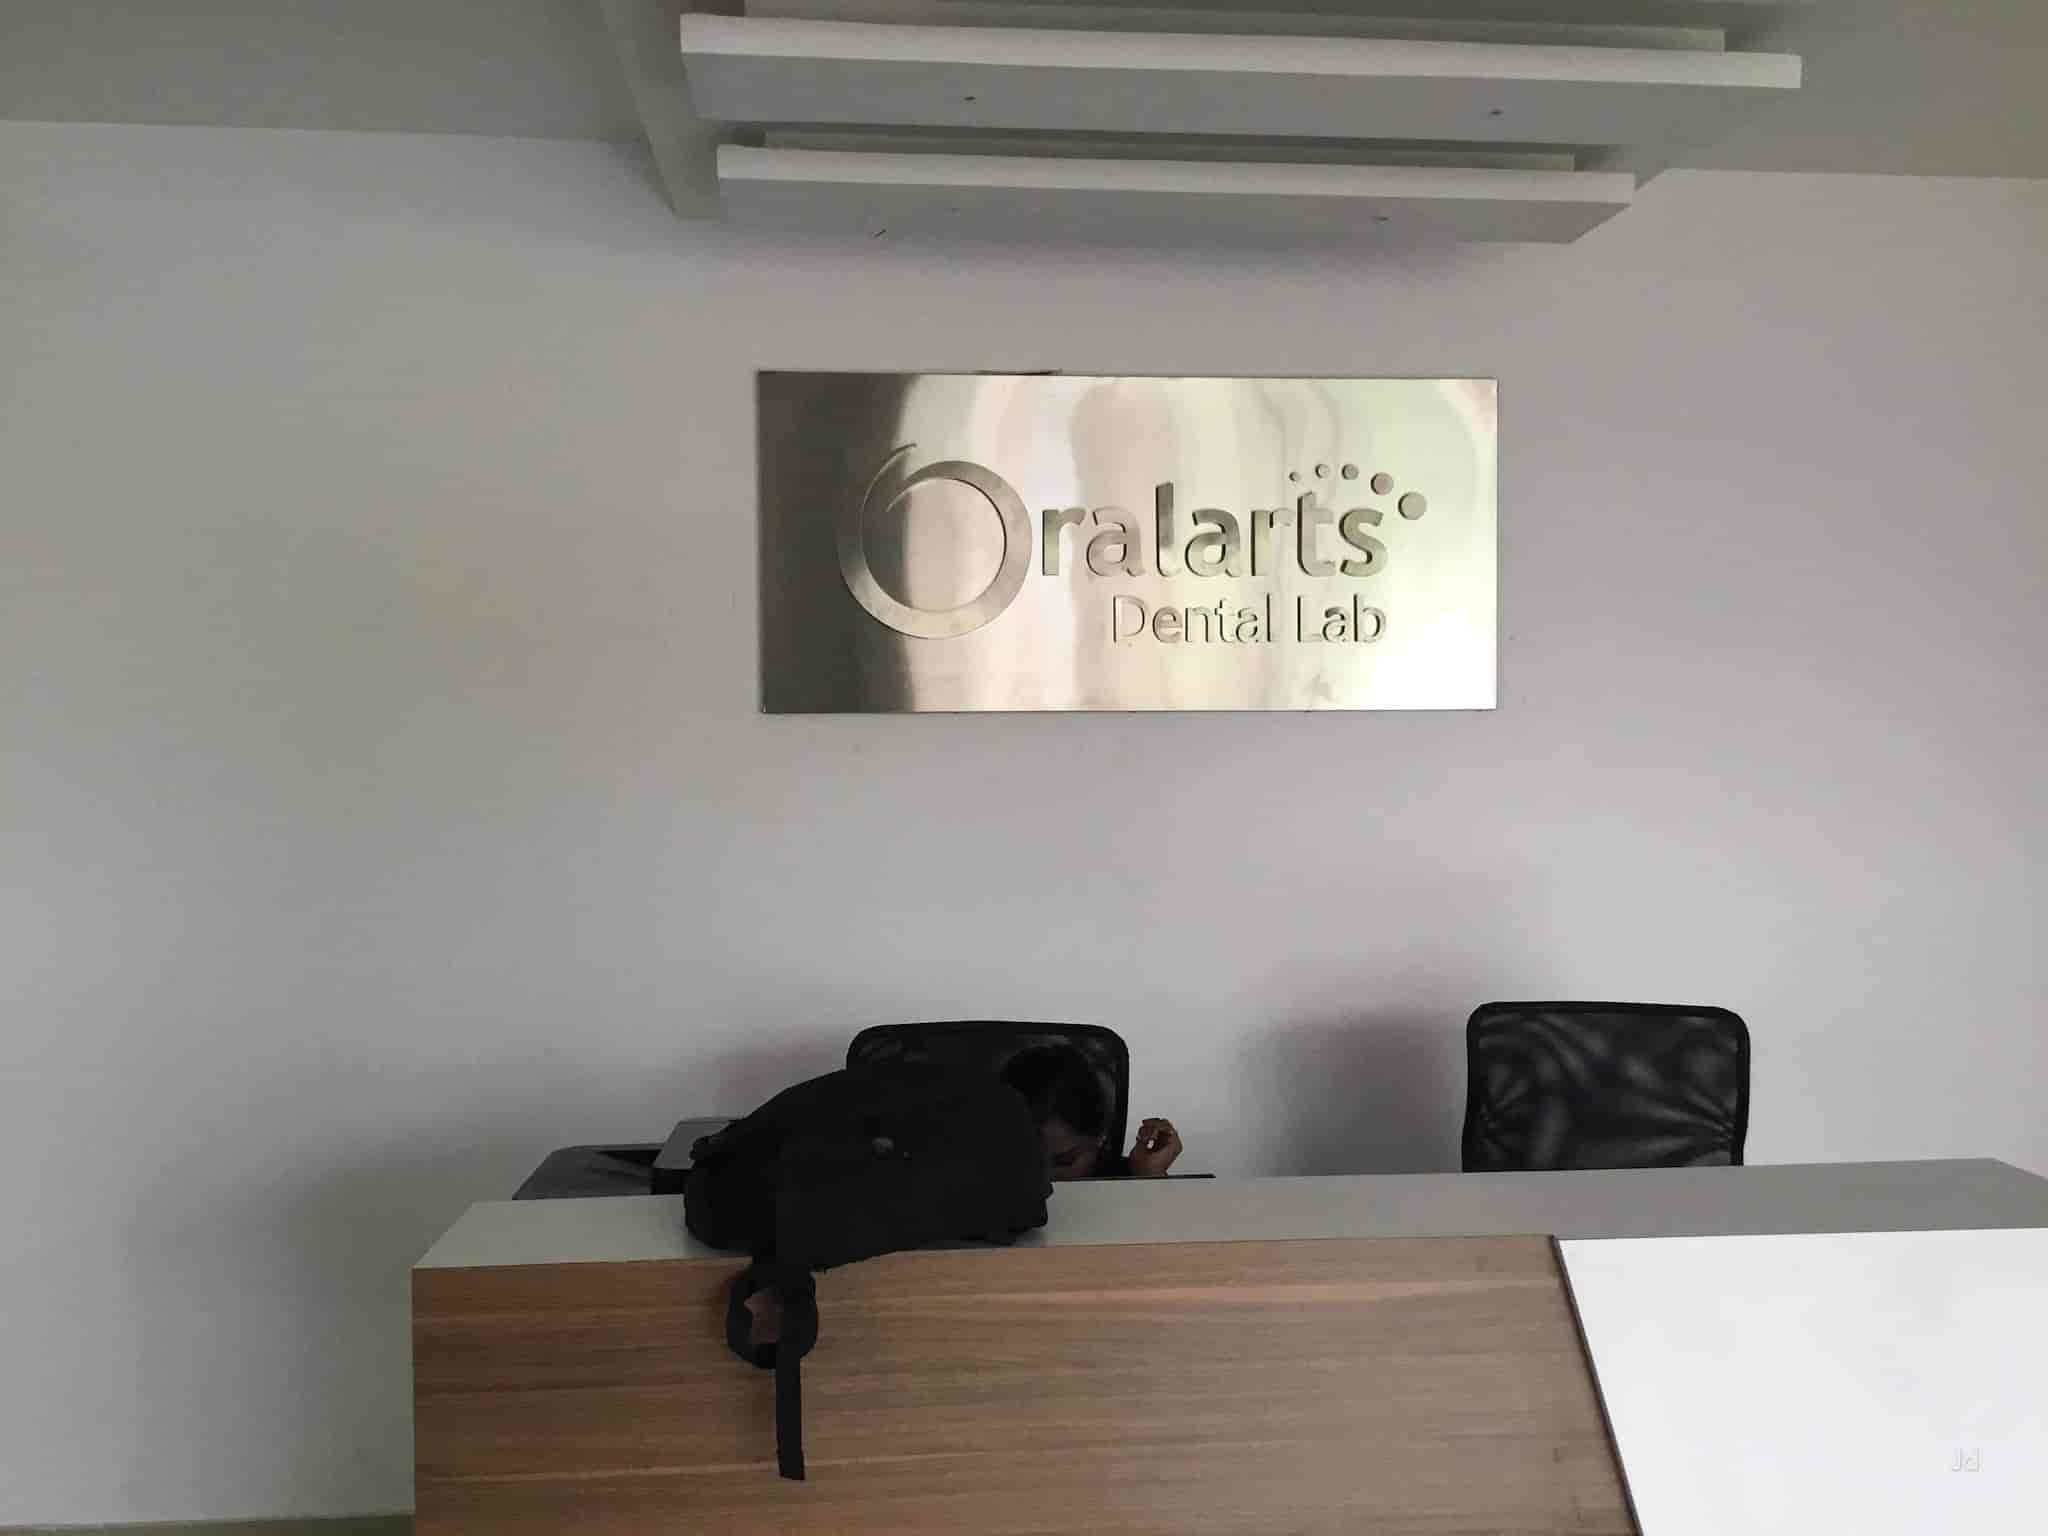 Oral Arts Dental Lab